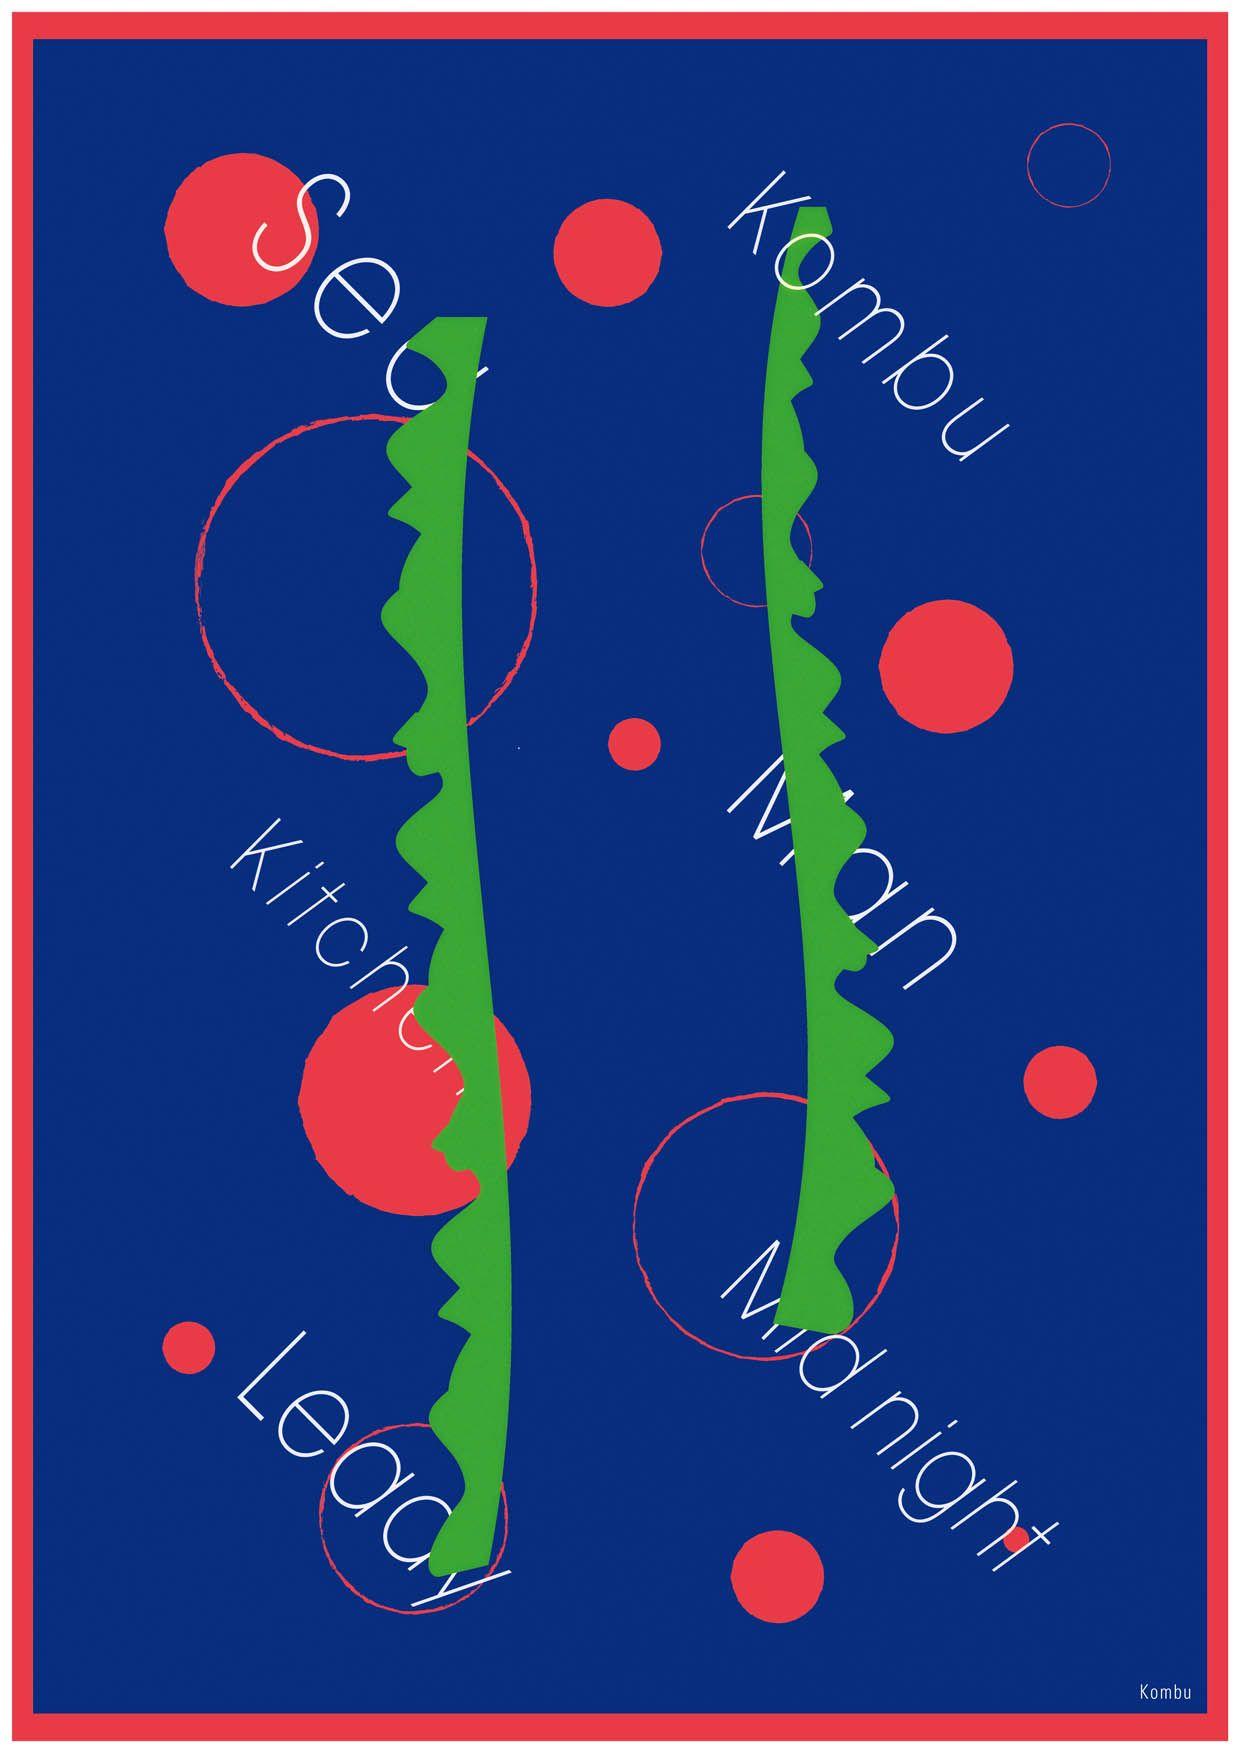 [exhibition] kitchen documentary (2013.06.08—06.12) size: B2 (graphic) design: Yutaka satoh